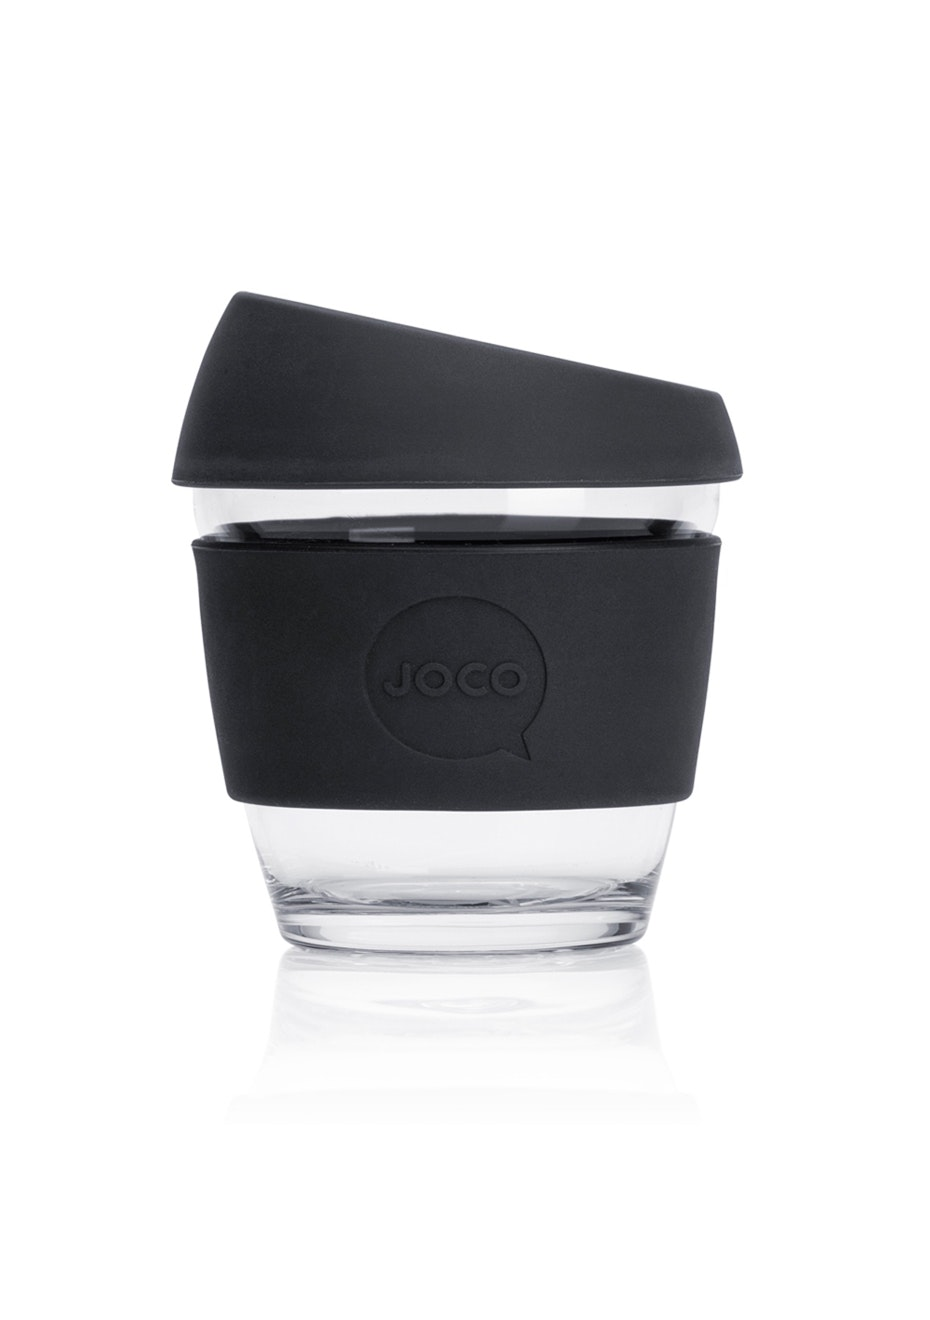 JOCO Cup 8oz - Black